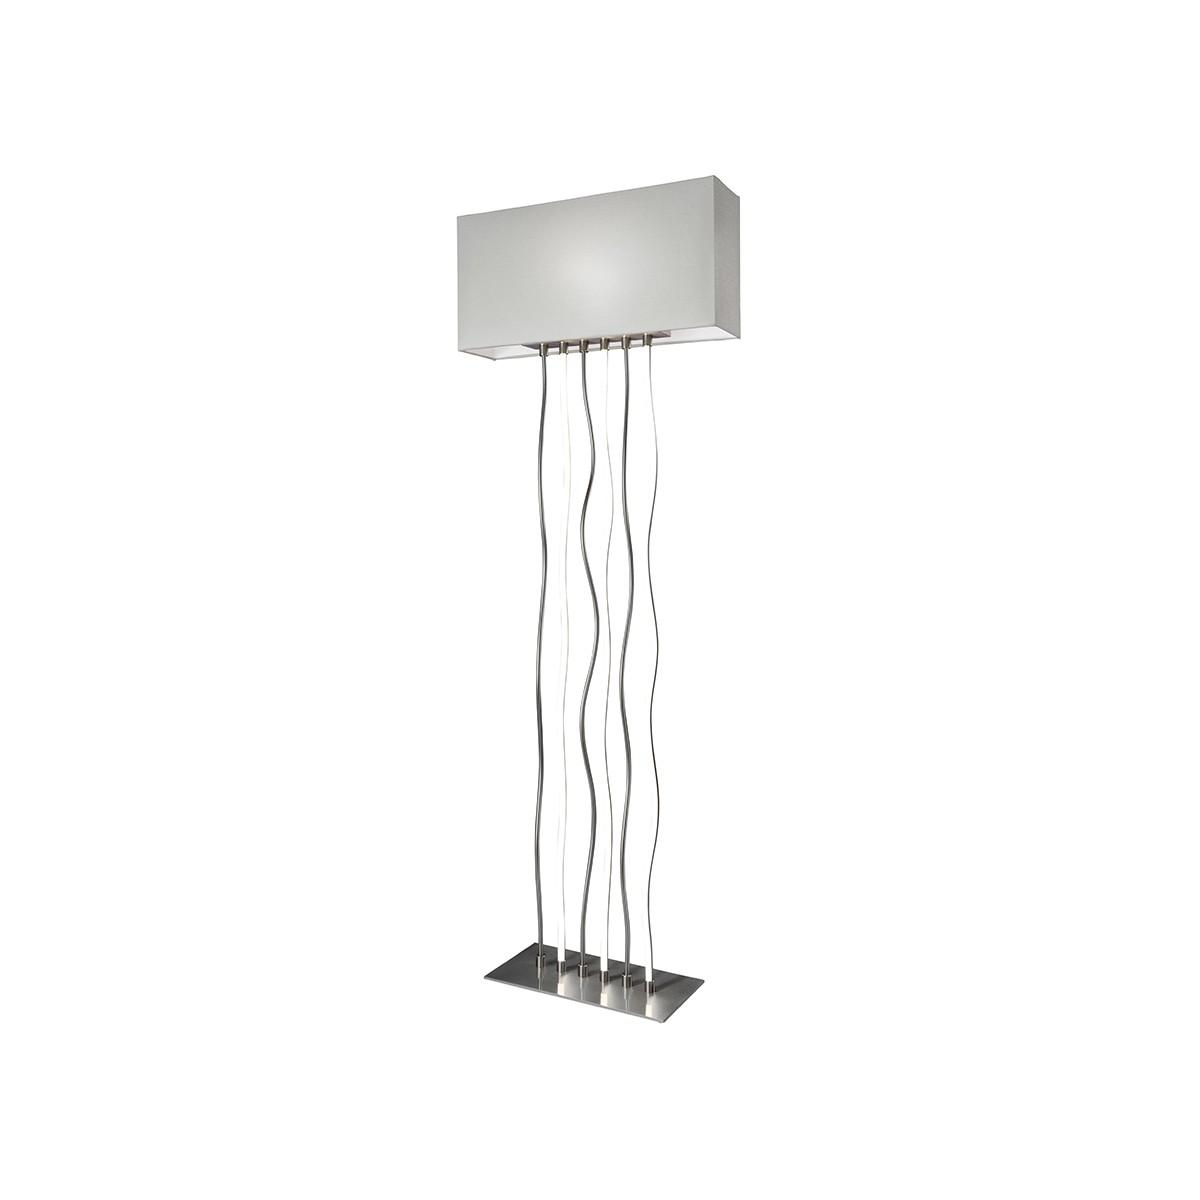 Sompex Viper LED Stehleuchte, Metall - Textil weiß